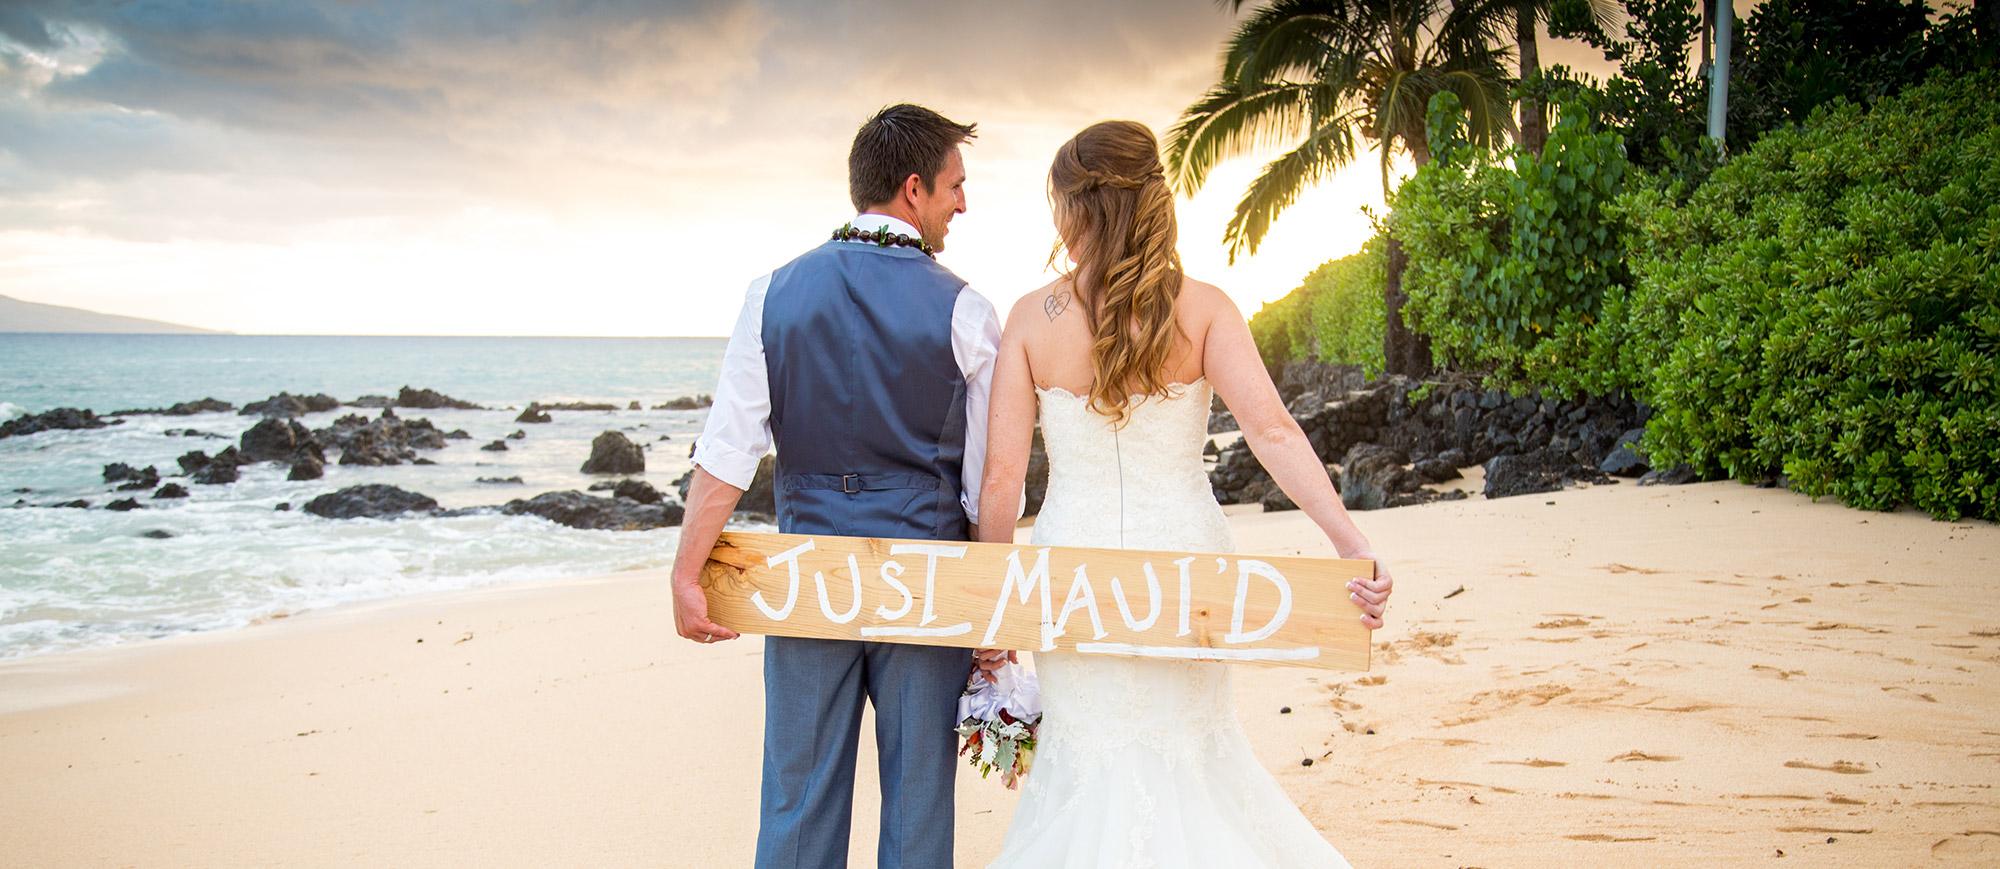 Maui Weddings :: Maui Wedding Packages